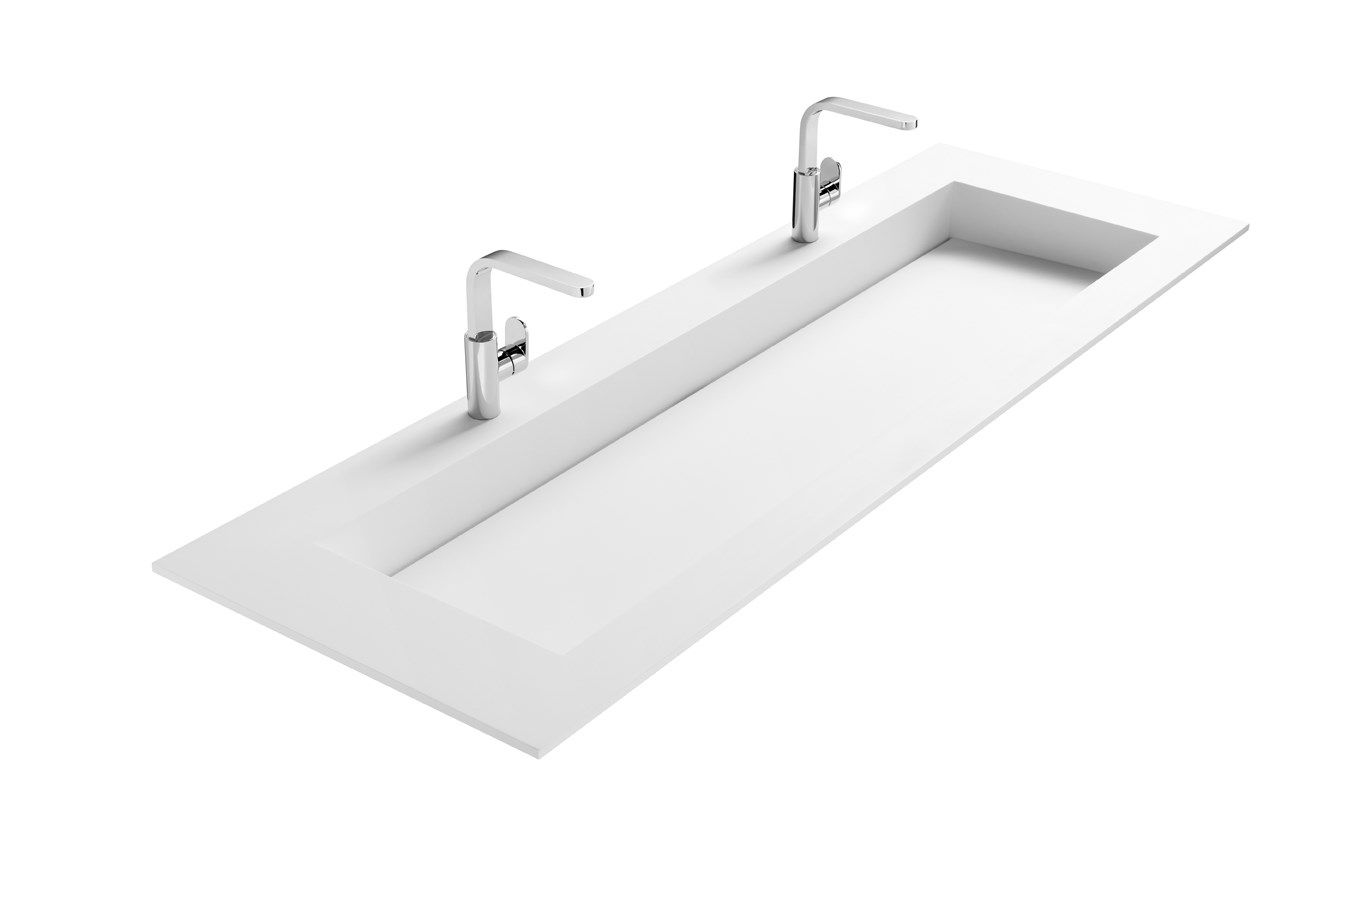 Wastafel 160 Cm : Mat witte wastafel van solid surface wastafel is cm breed en